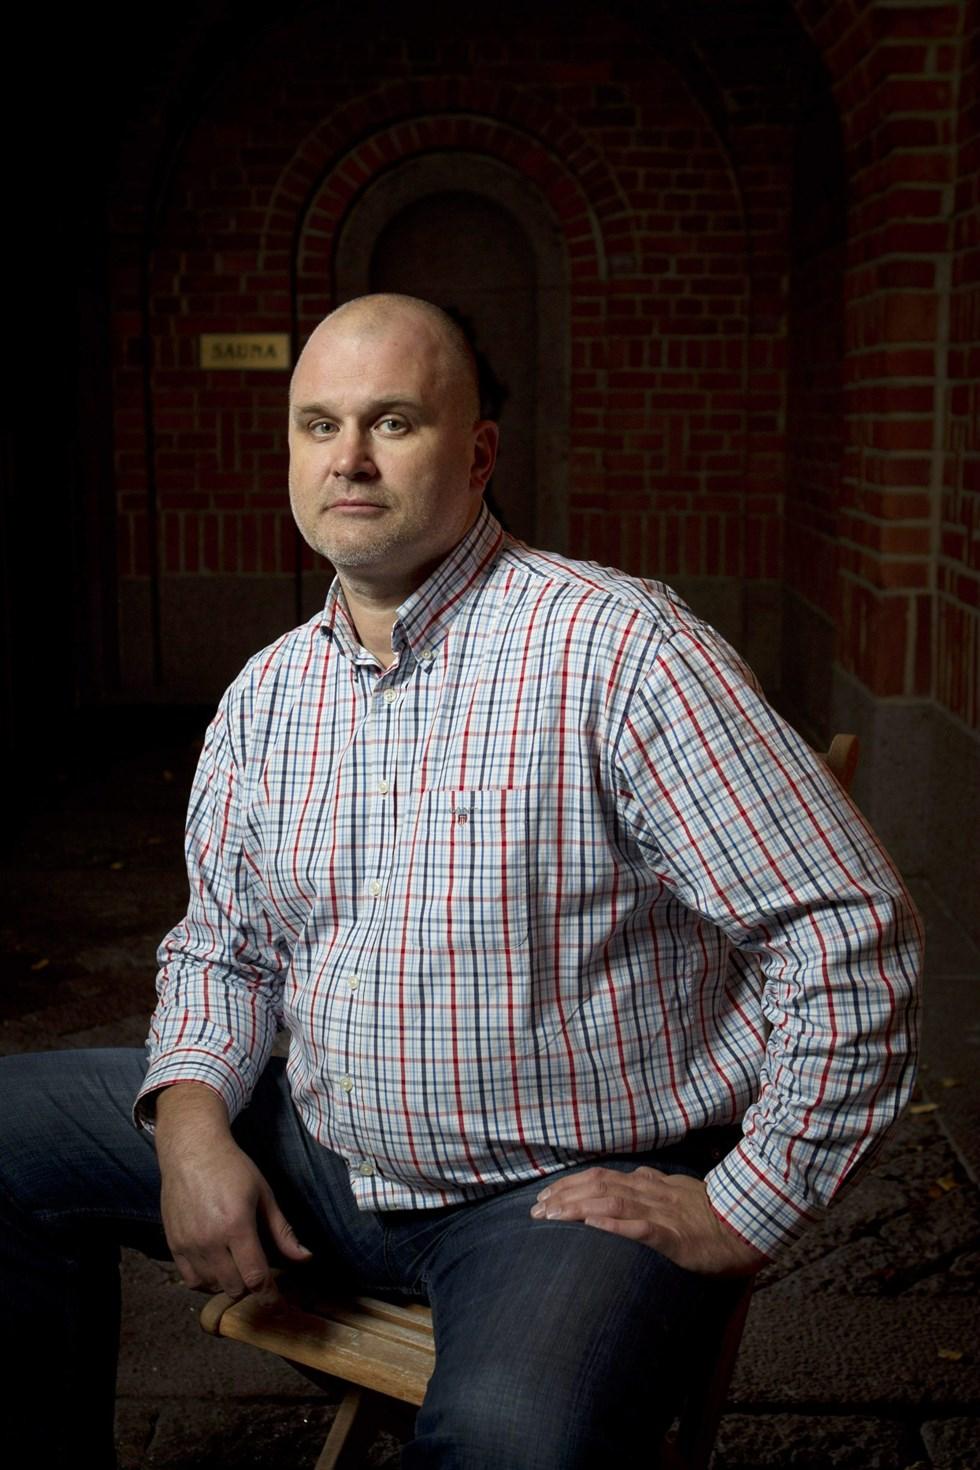 Jouko Jokinen ny chefredaktör för Yle - Vasabladet